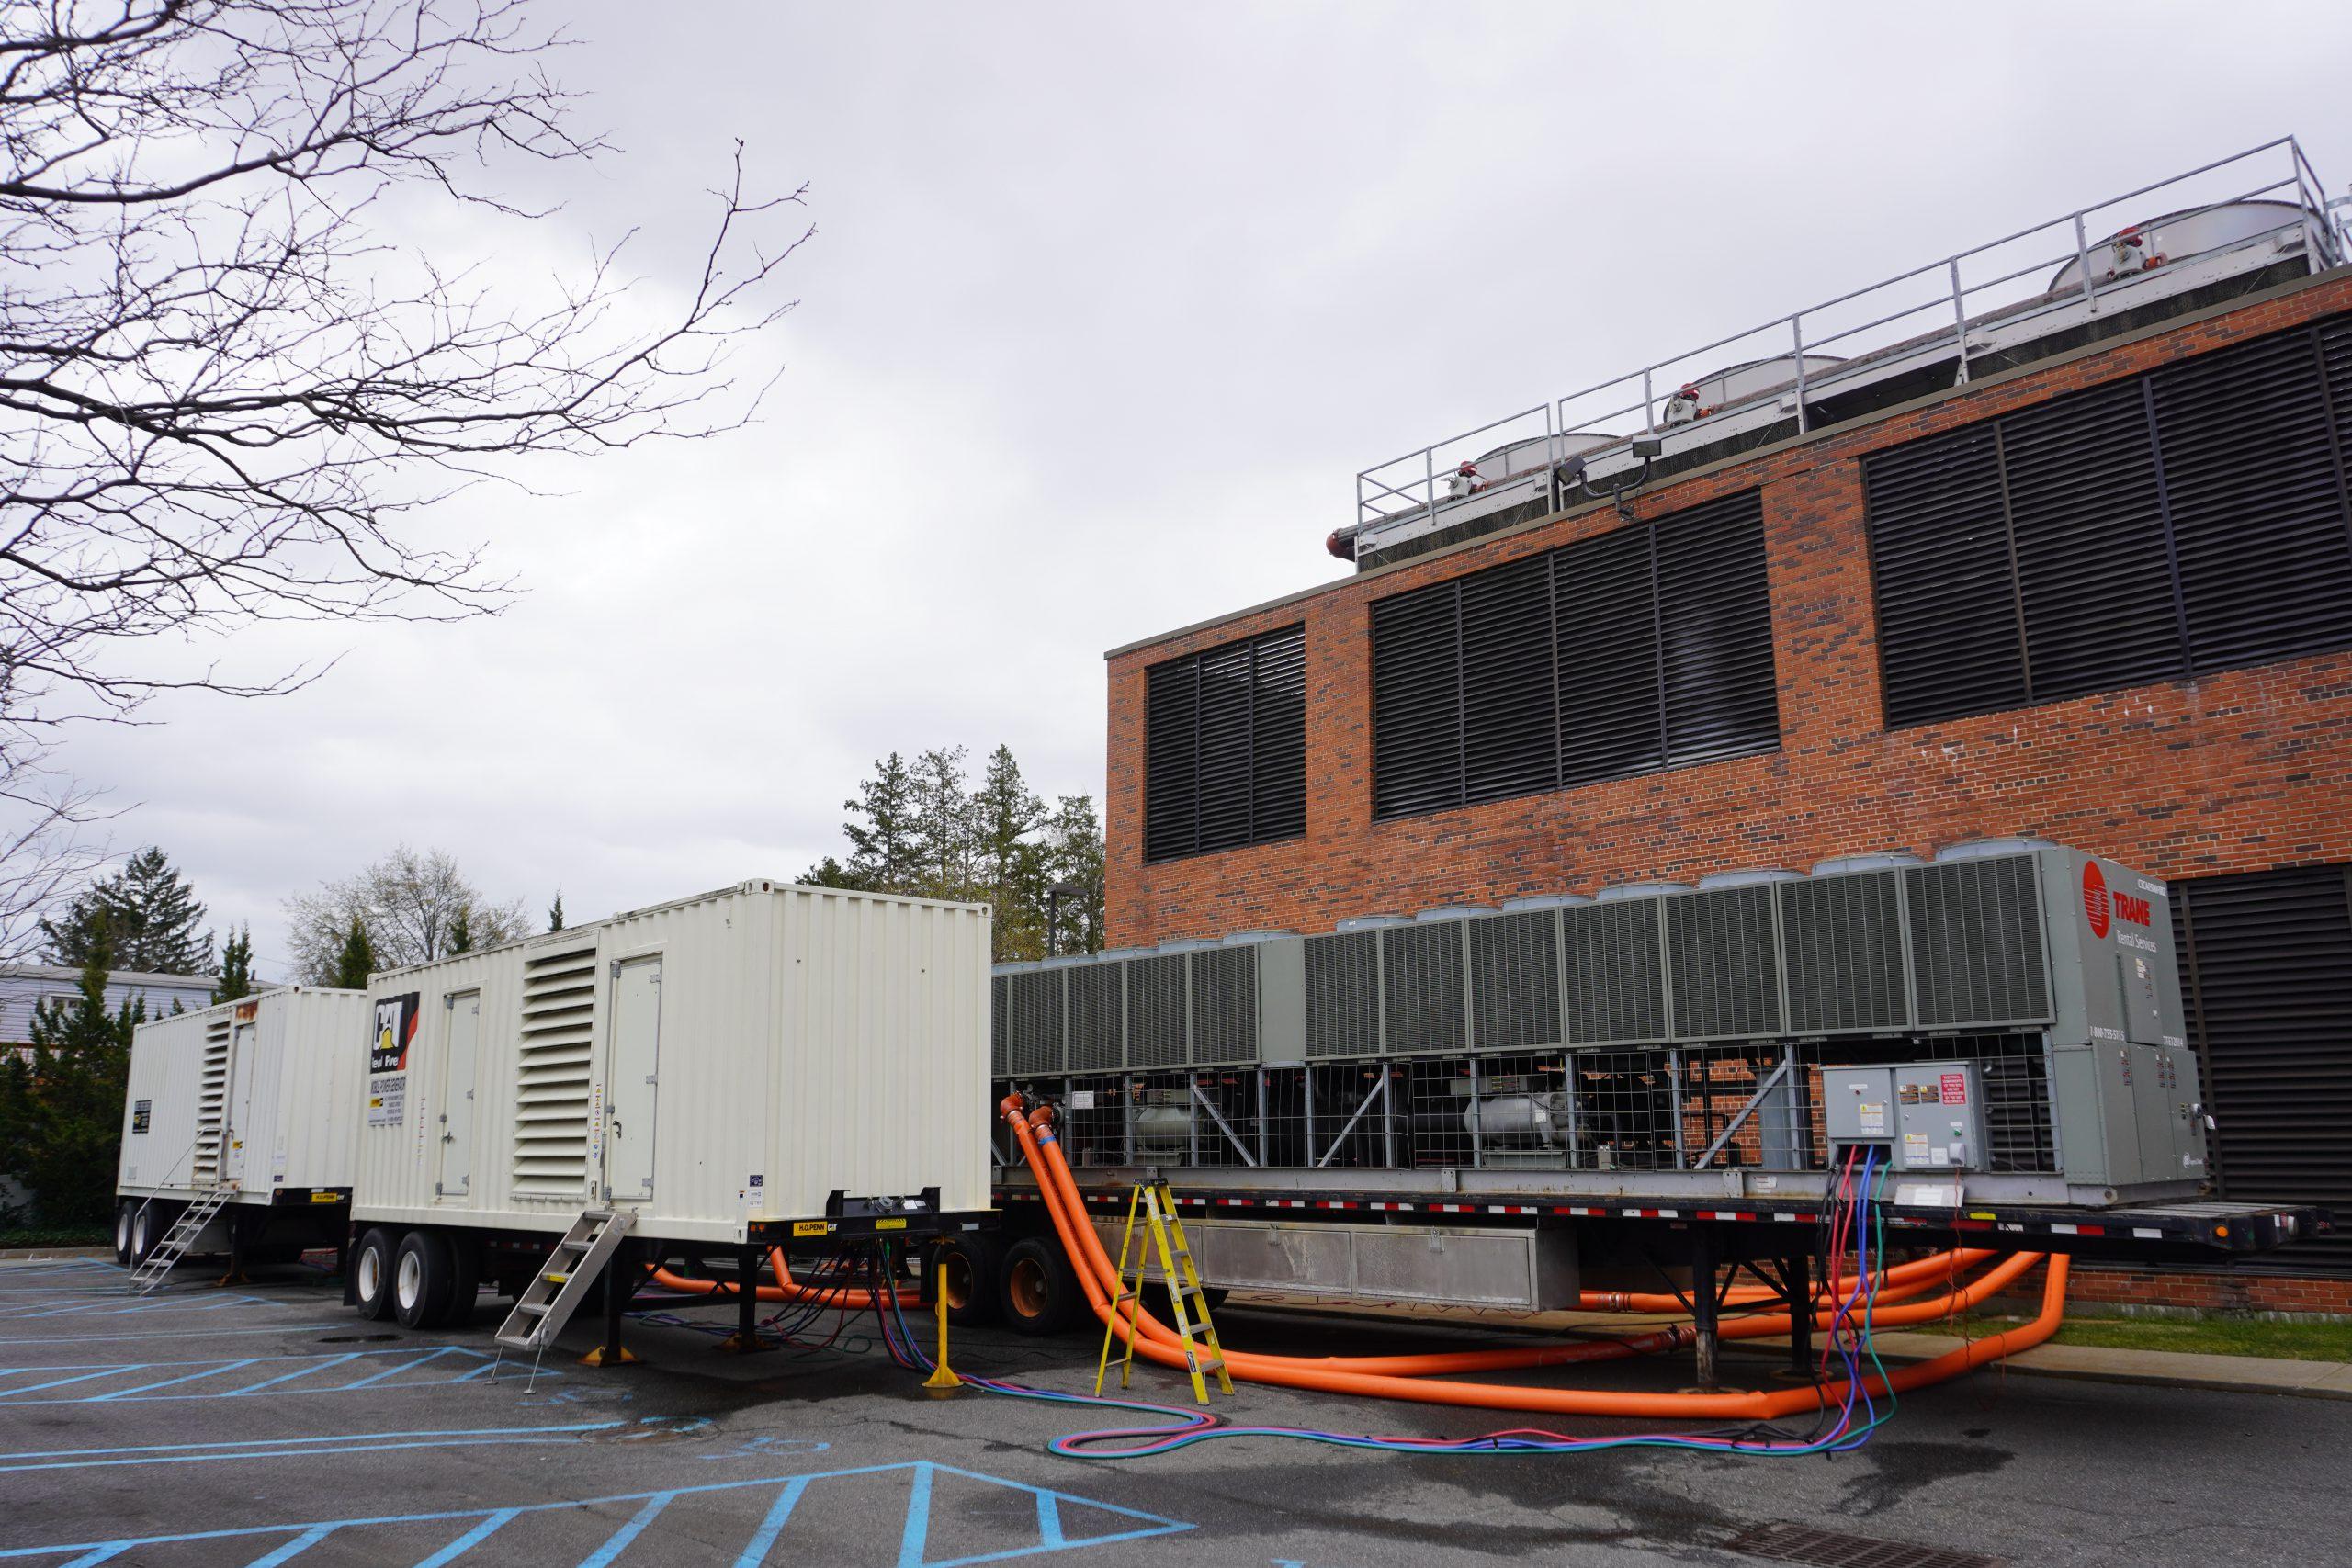 South Nassau Mt Sinai , Coronavirus , COVID-19 , Rental Chiller Installation PA , Rental Chiller Installation Philly , Rental Chiller Installation Wash DC , Rental Chiller Installation Baltimore